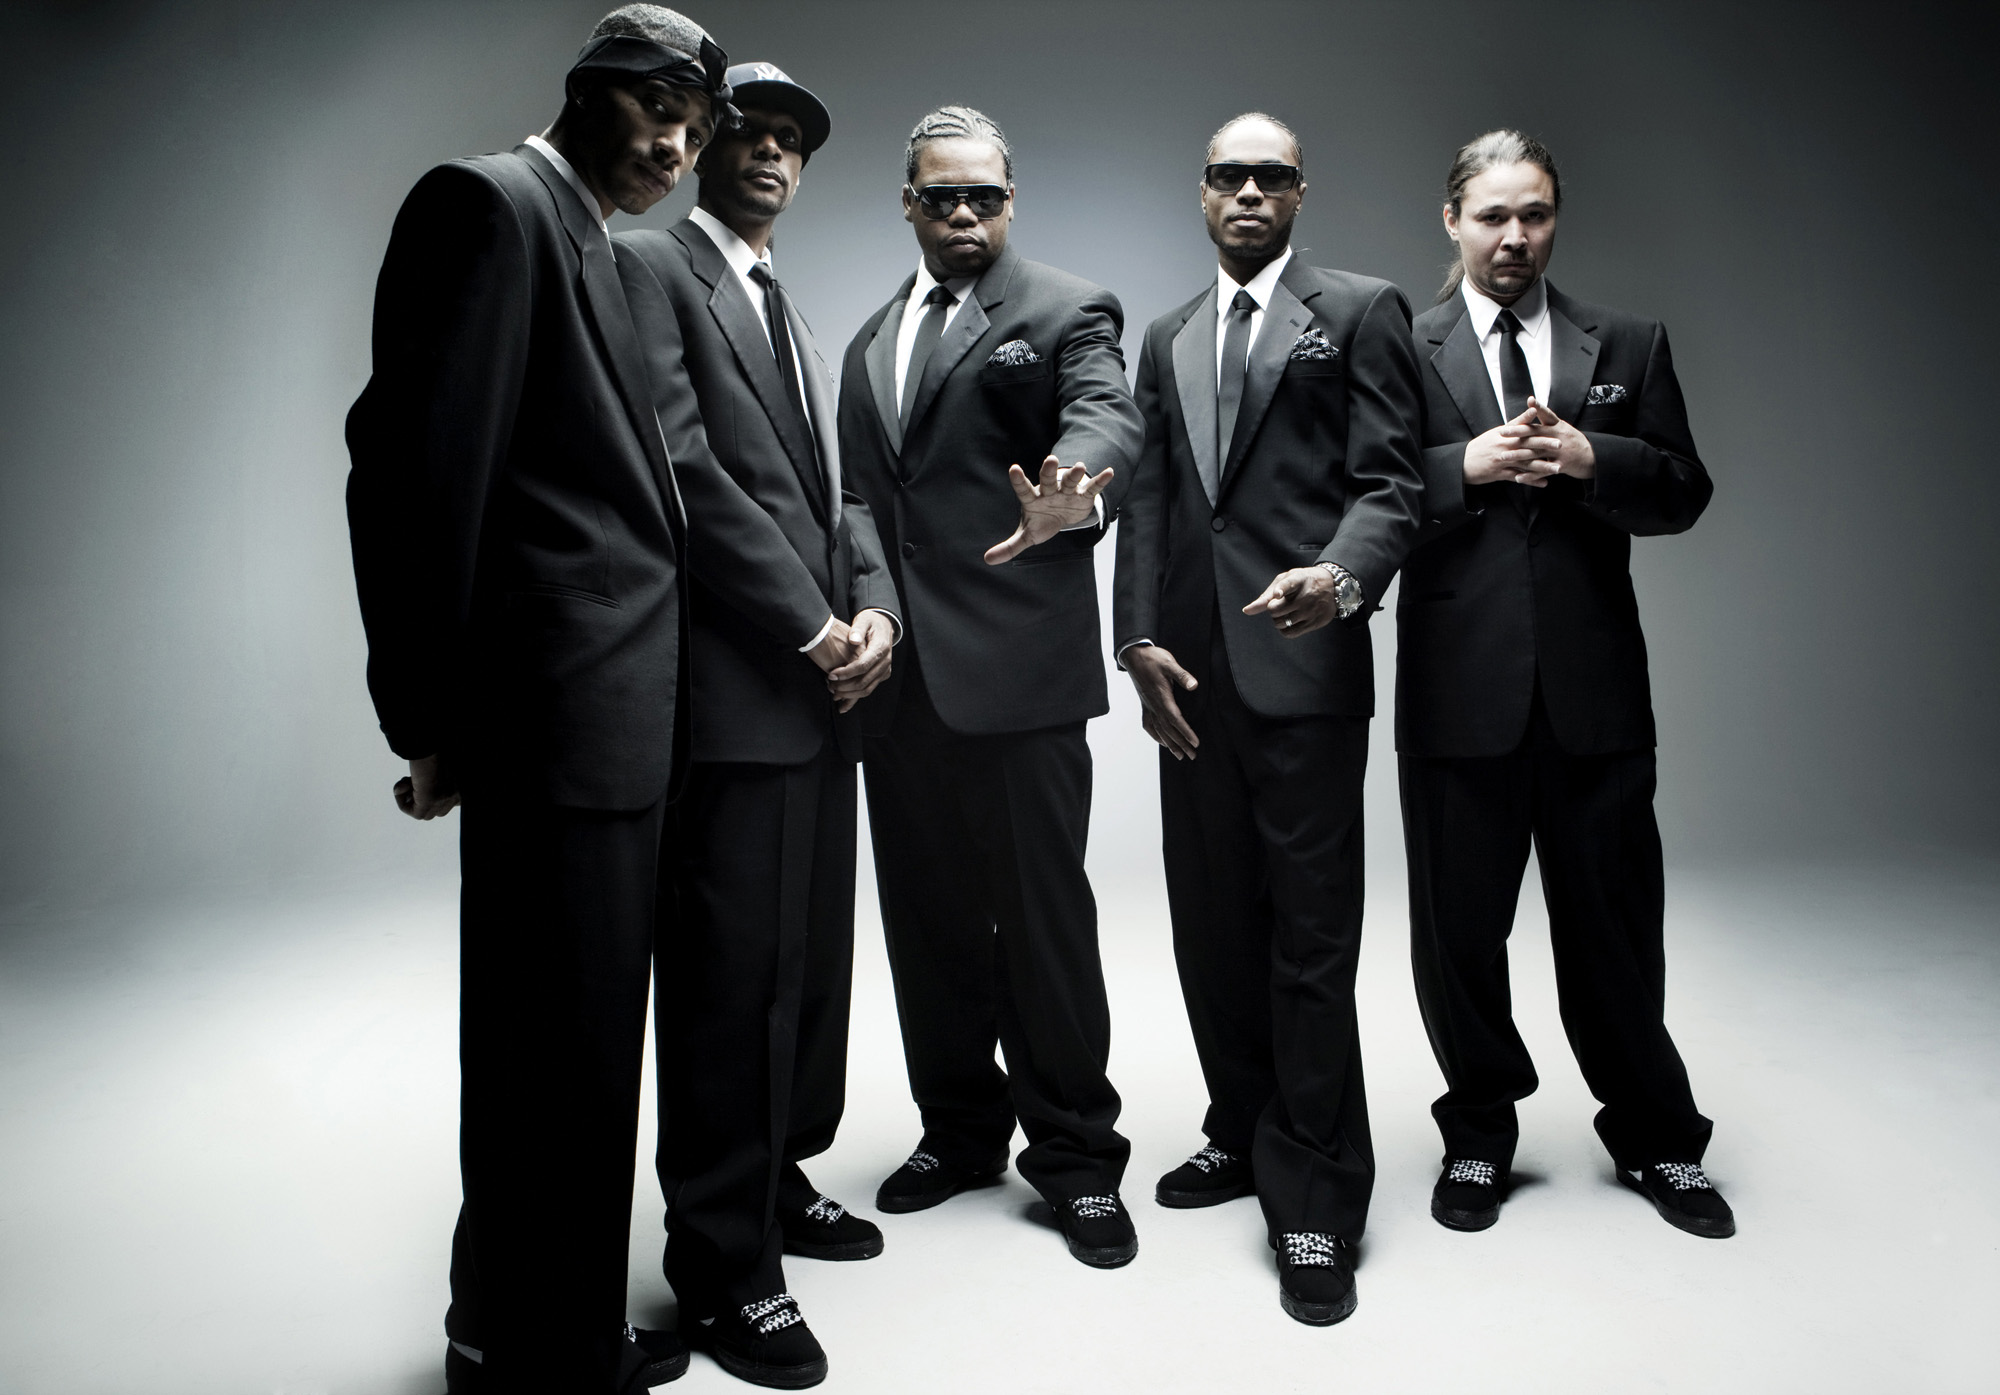 Bone Thugs-n-Harmony em São Paulo em 2015 - Via Marquês - ObaOba 3ca8e69cf4f